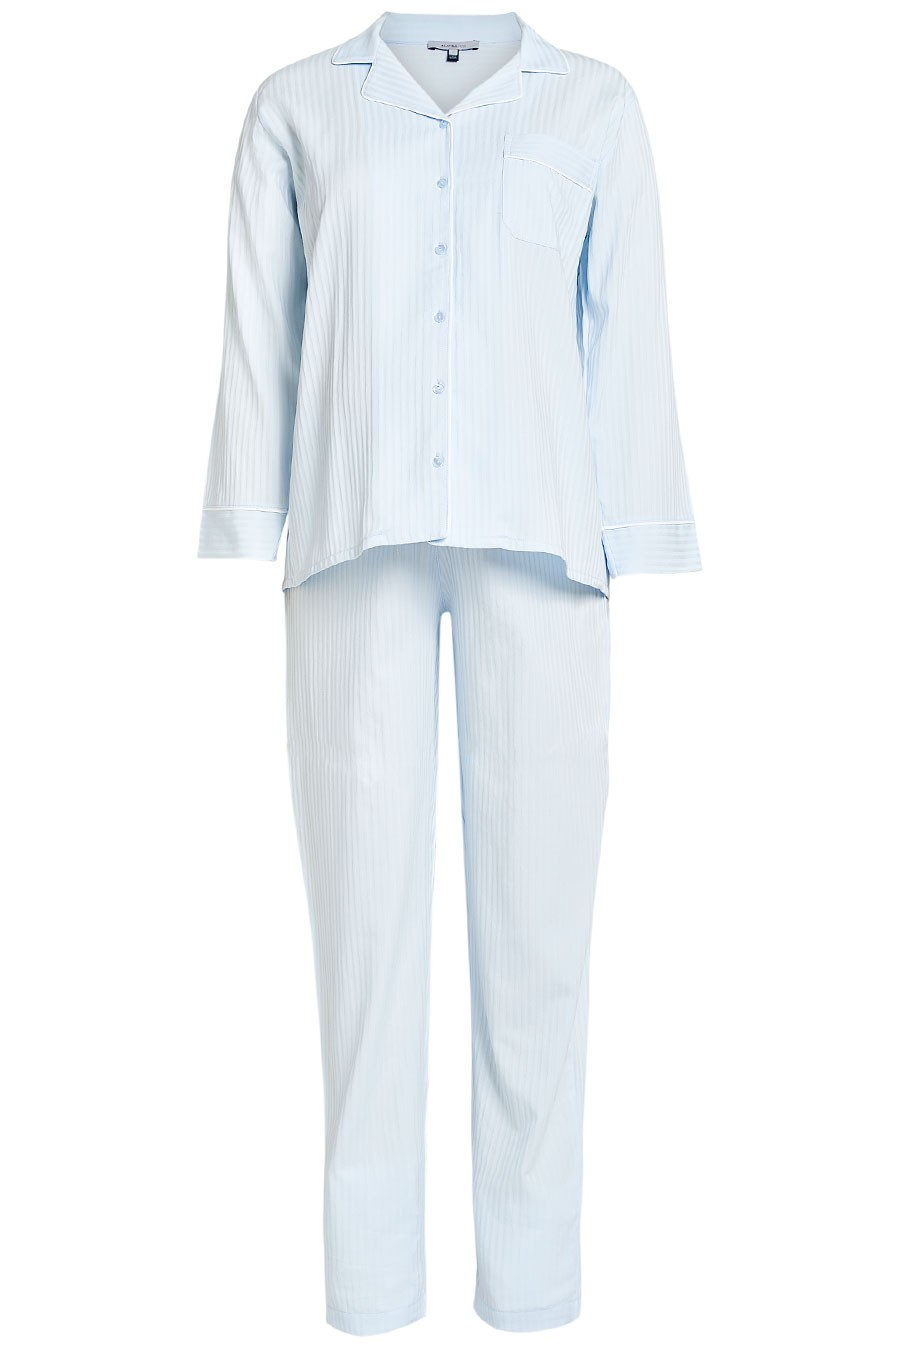 CLASSIC PJ - Cotton